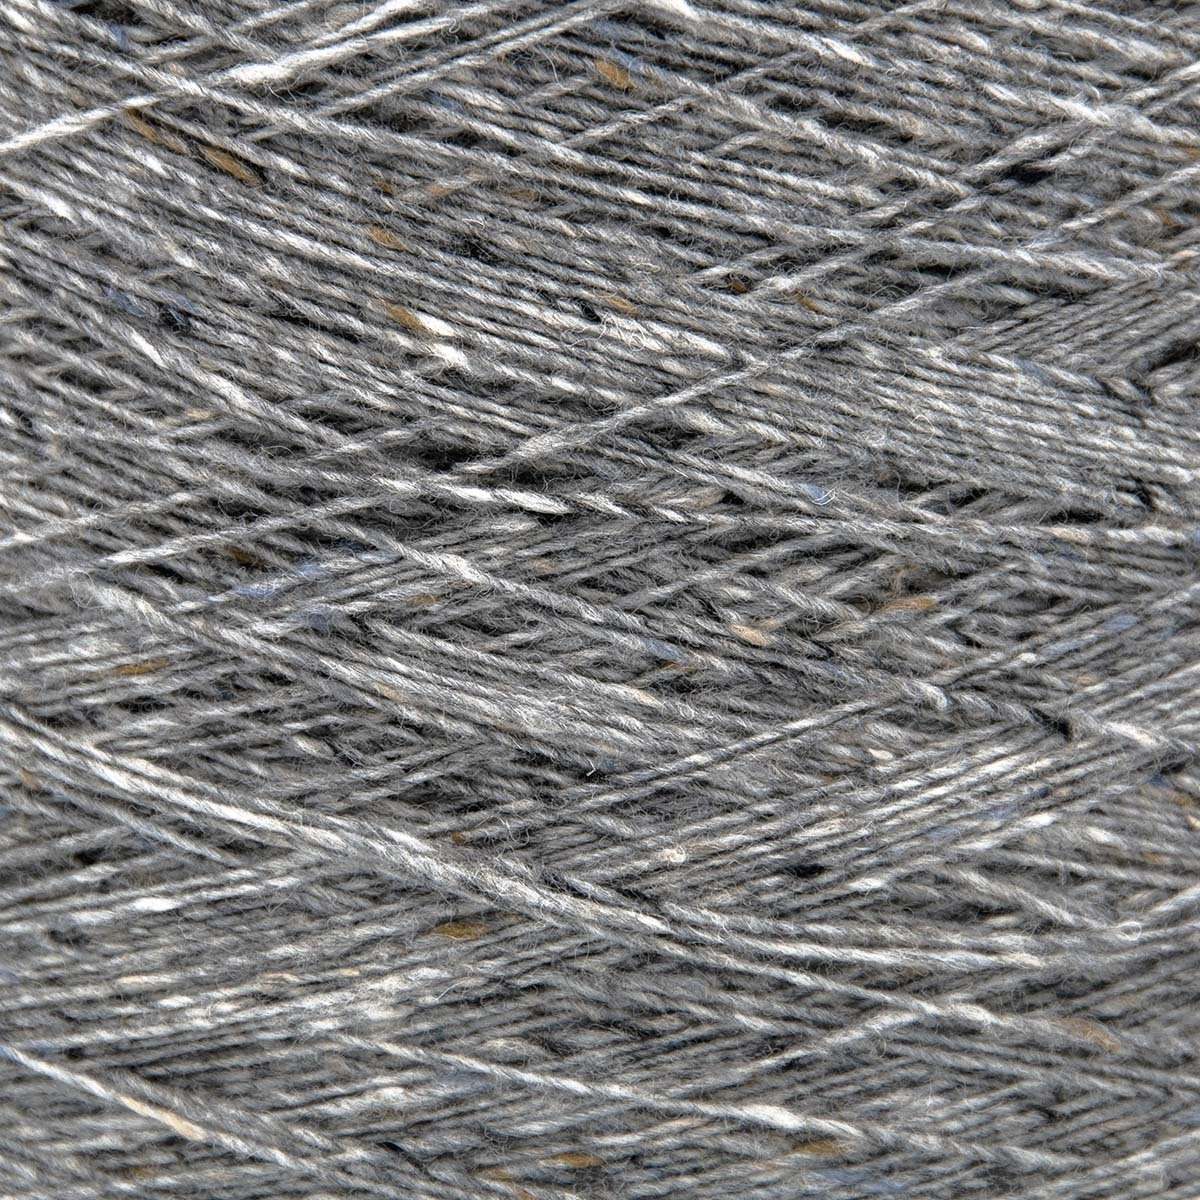 Knoll Yarns Soft Donegal (одинарный твид) - 5509